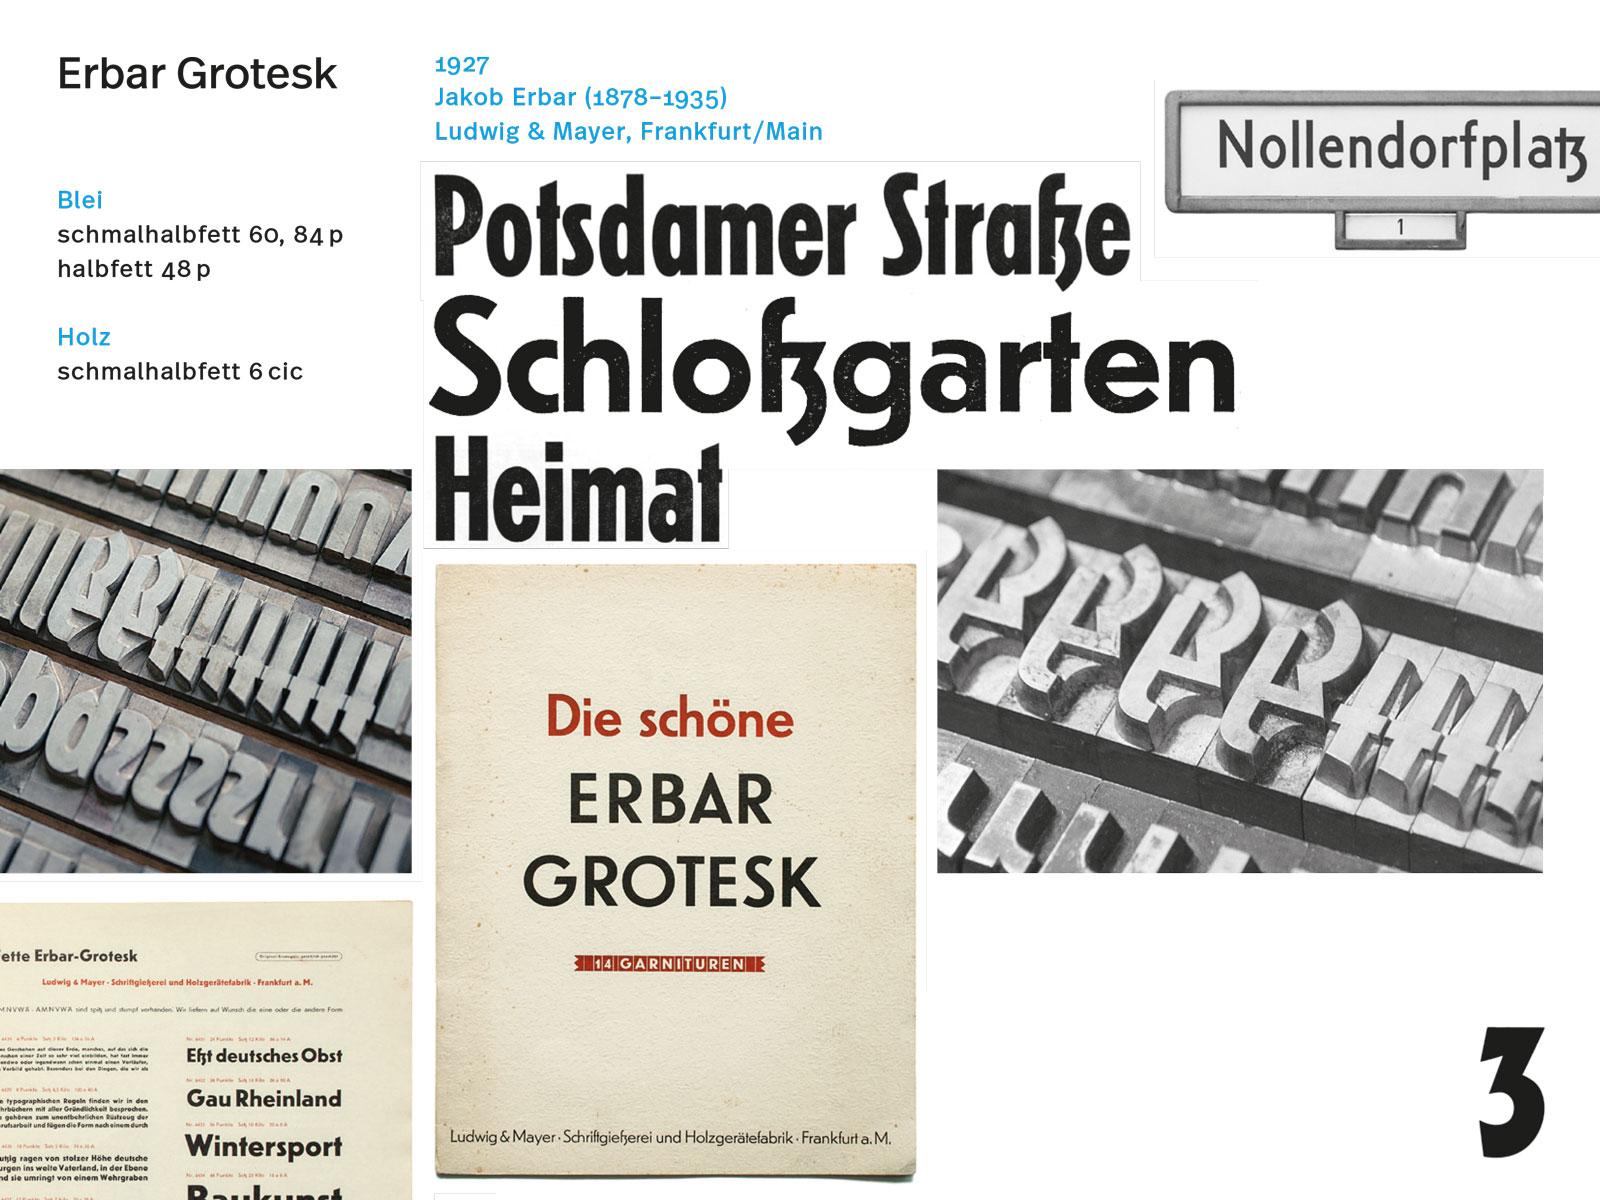 Ferdinand Ulrich – 20 bemerkenswerte Schriften aus der Werkstatt p98a